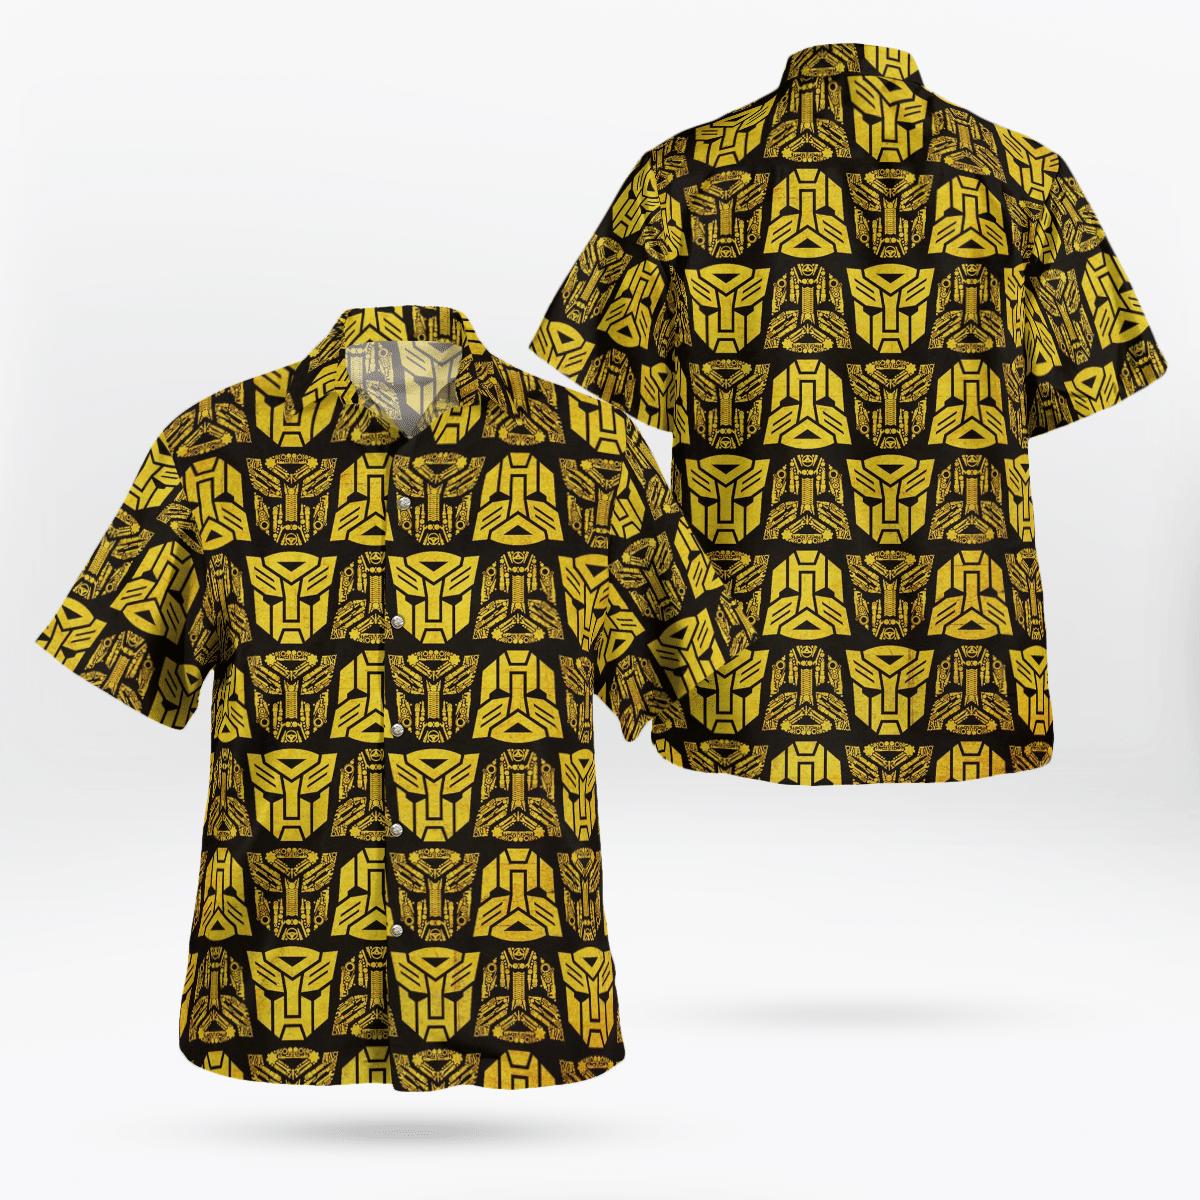 Transformers Optimus Prime Golden Hawaiian Shirt